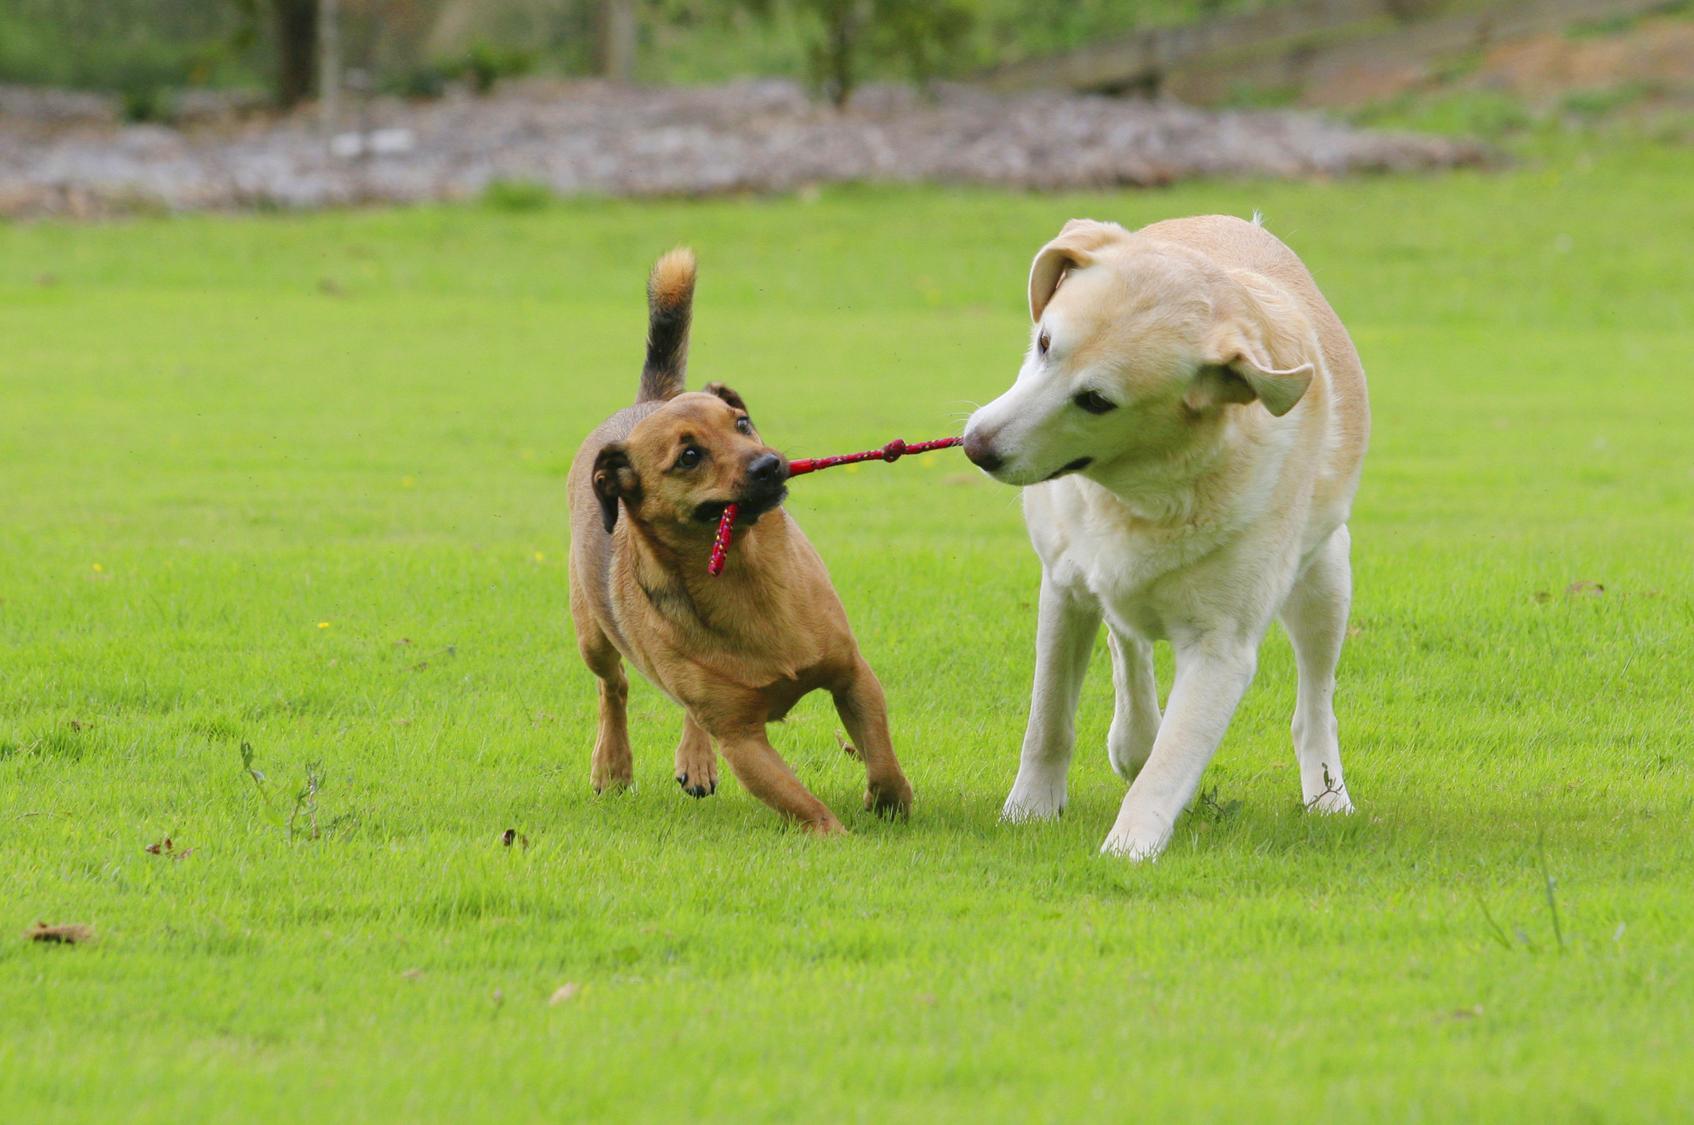 Good Toys For Older Dogs